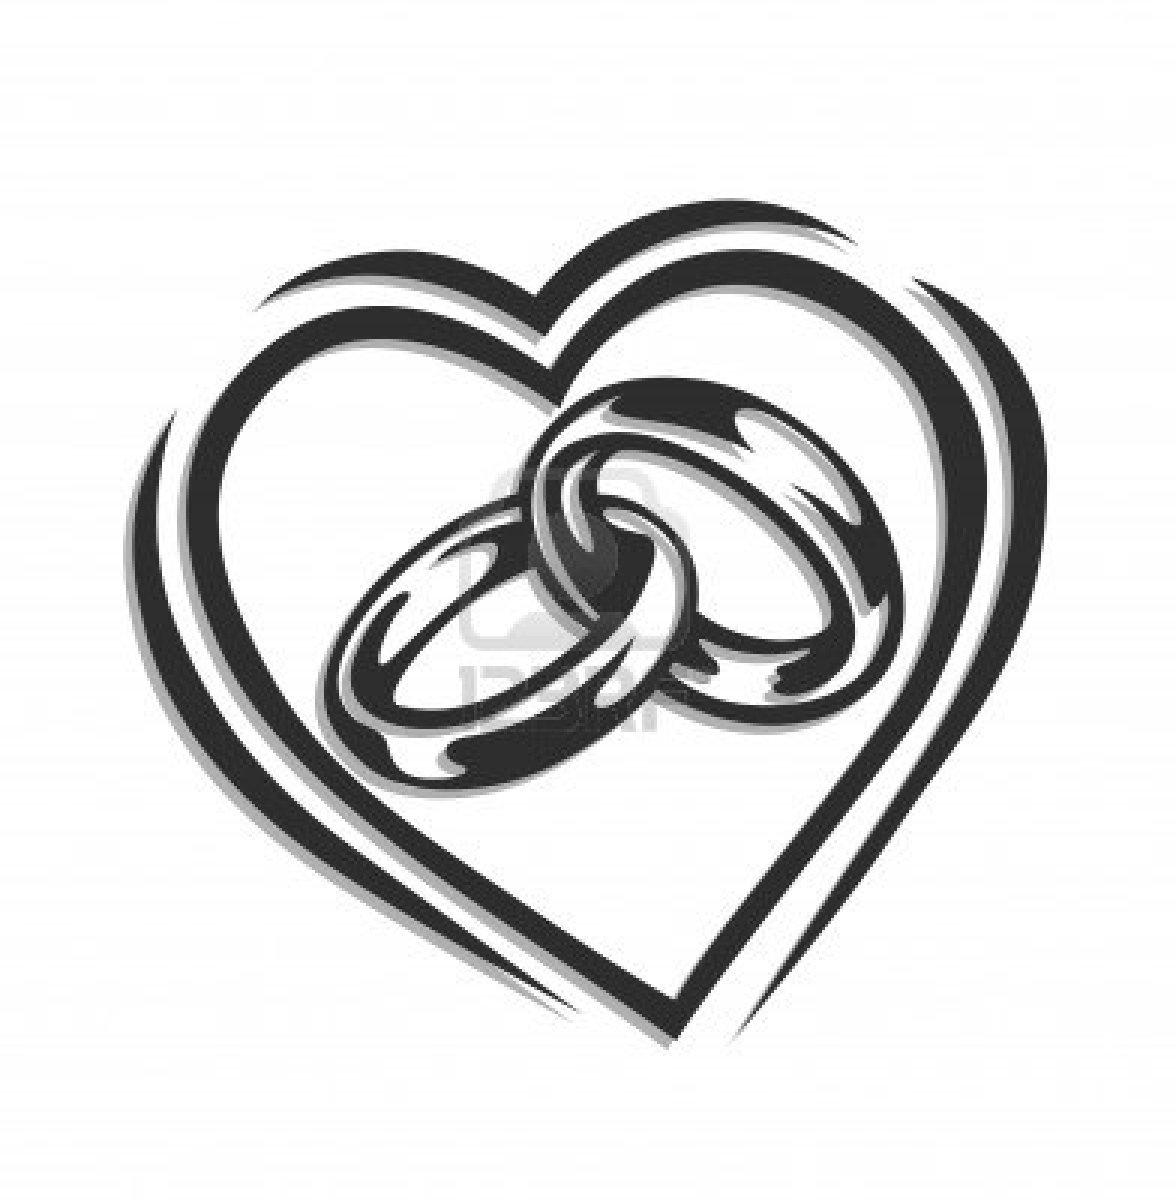 hight resolution of trends for interlocking wedding rings clip art